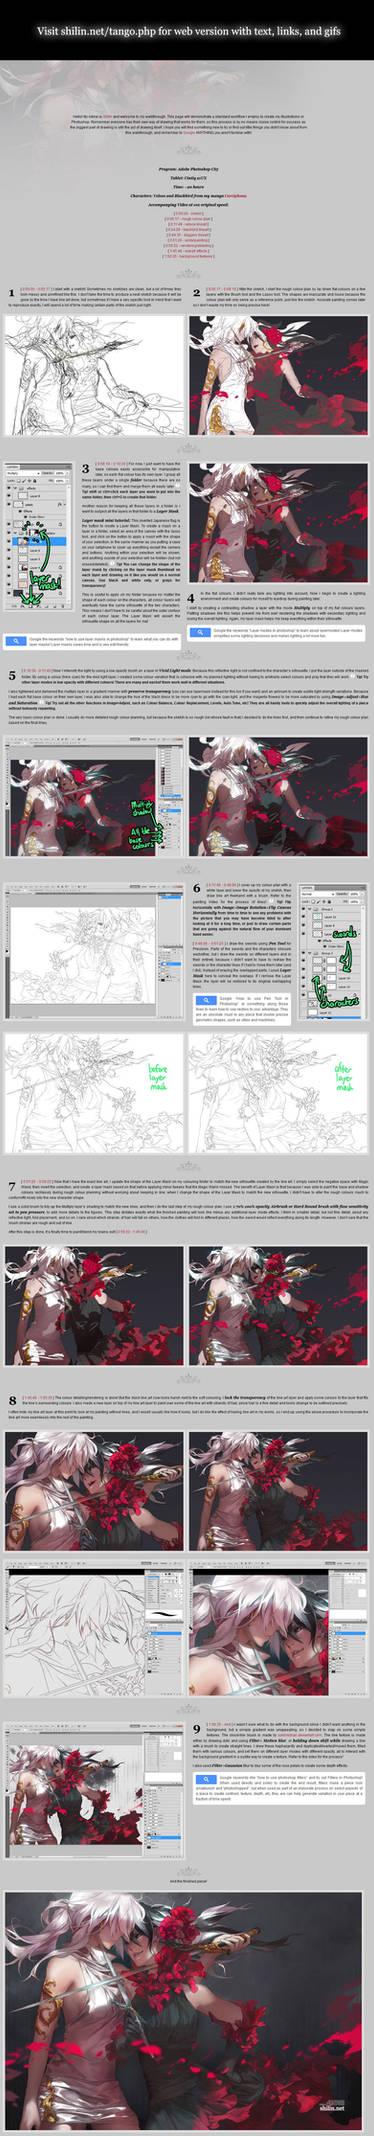 2013 Shilin's drawing tutorial/walkthrough